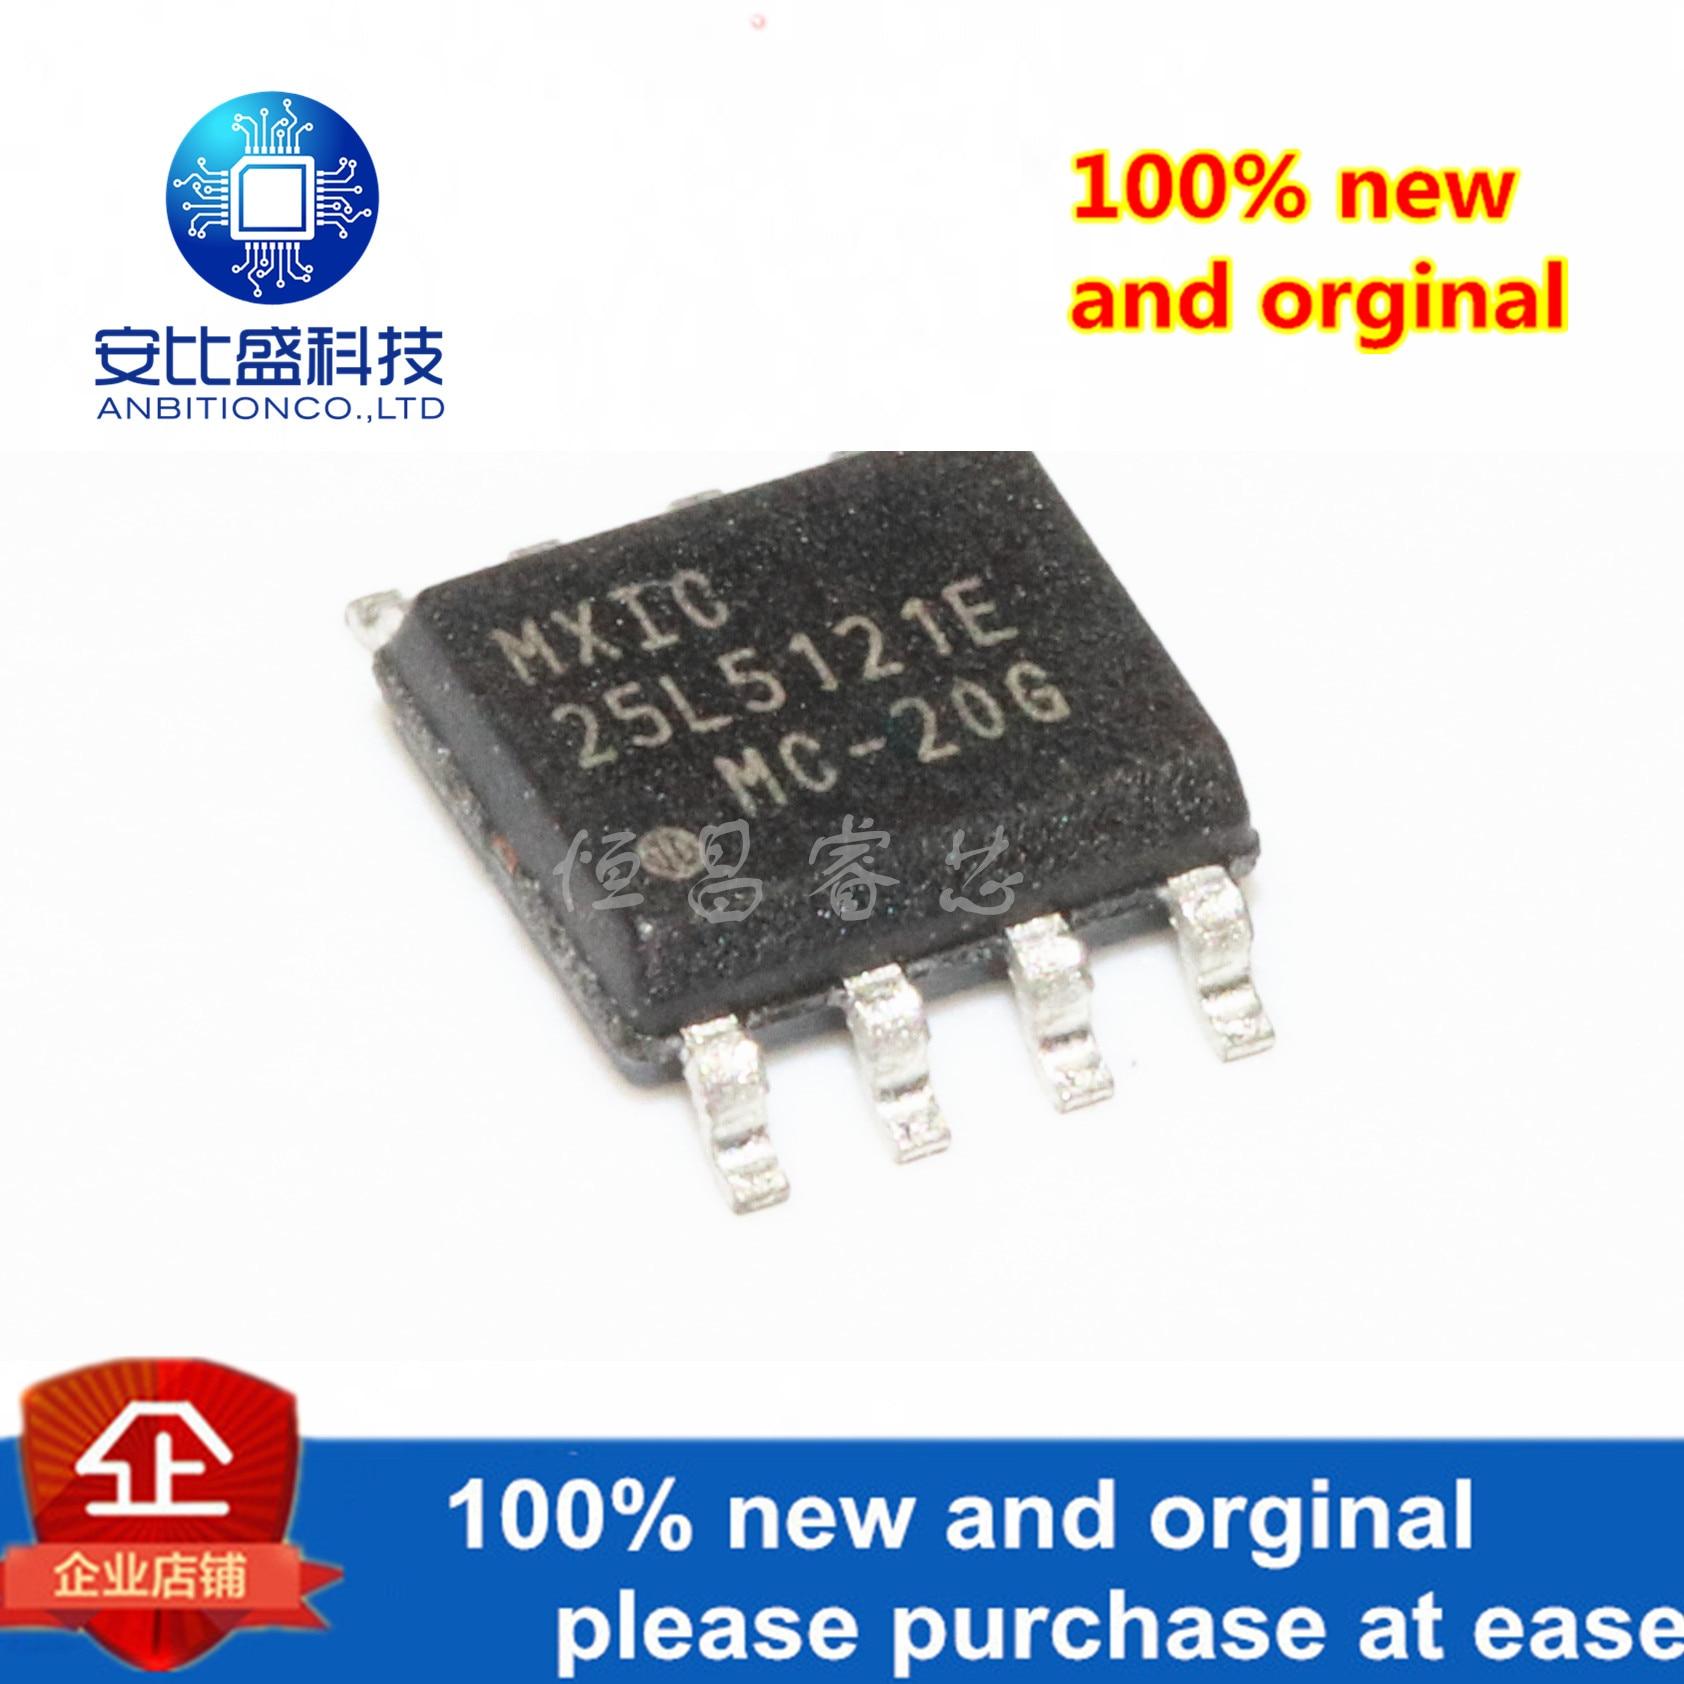 10pcs 100% New And Orginal MX25L5121EMC-20G Silk-screen 25L5121EMC-20G 512Kbits In Stock